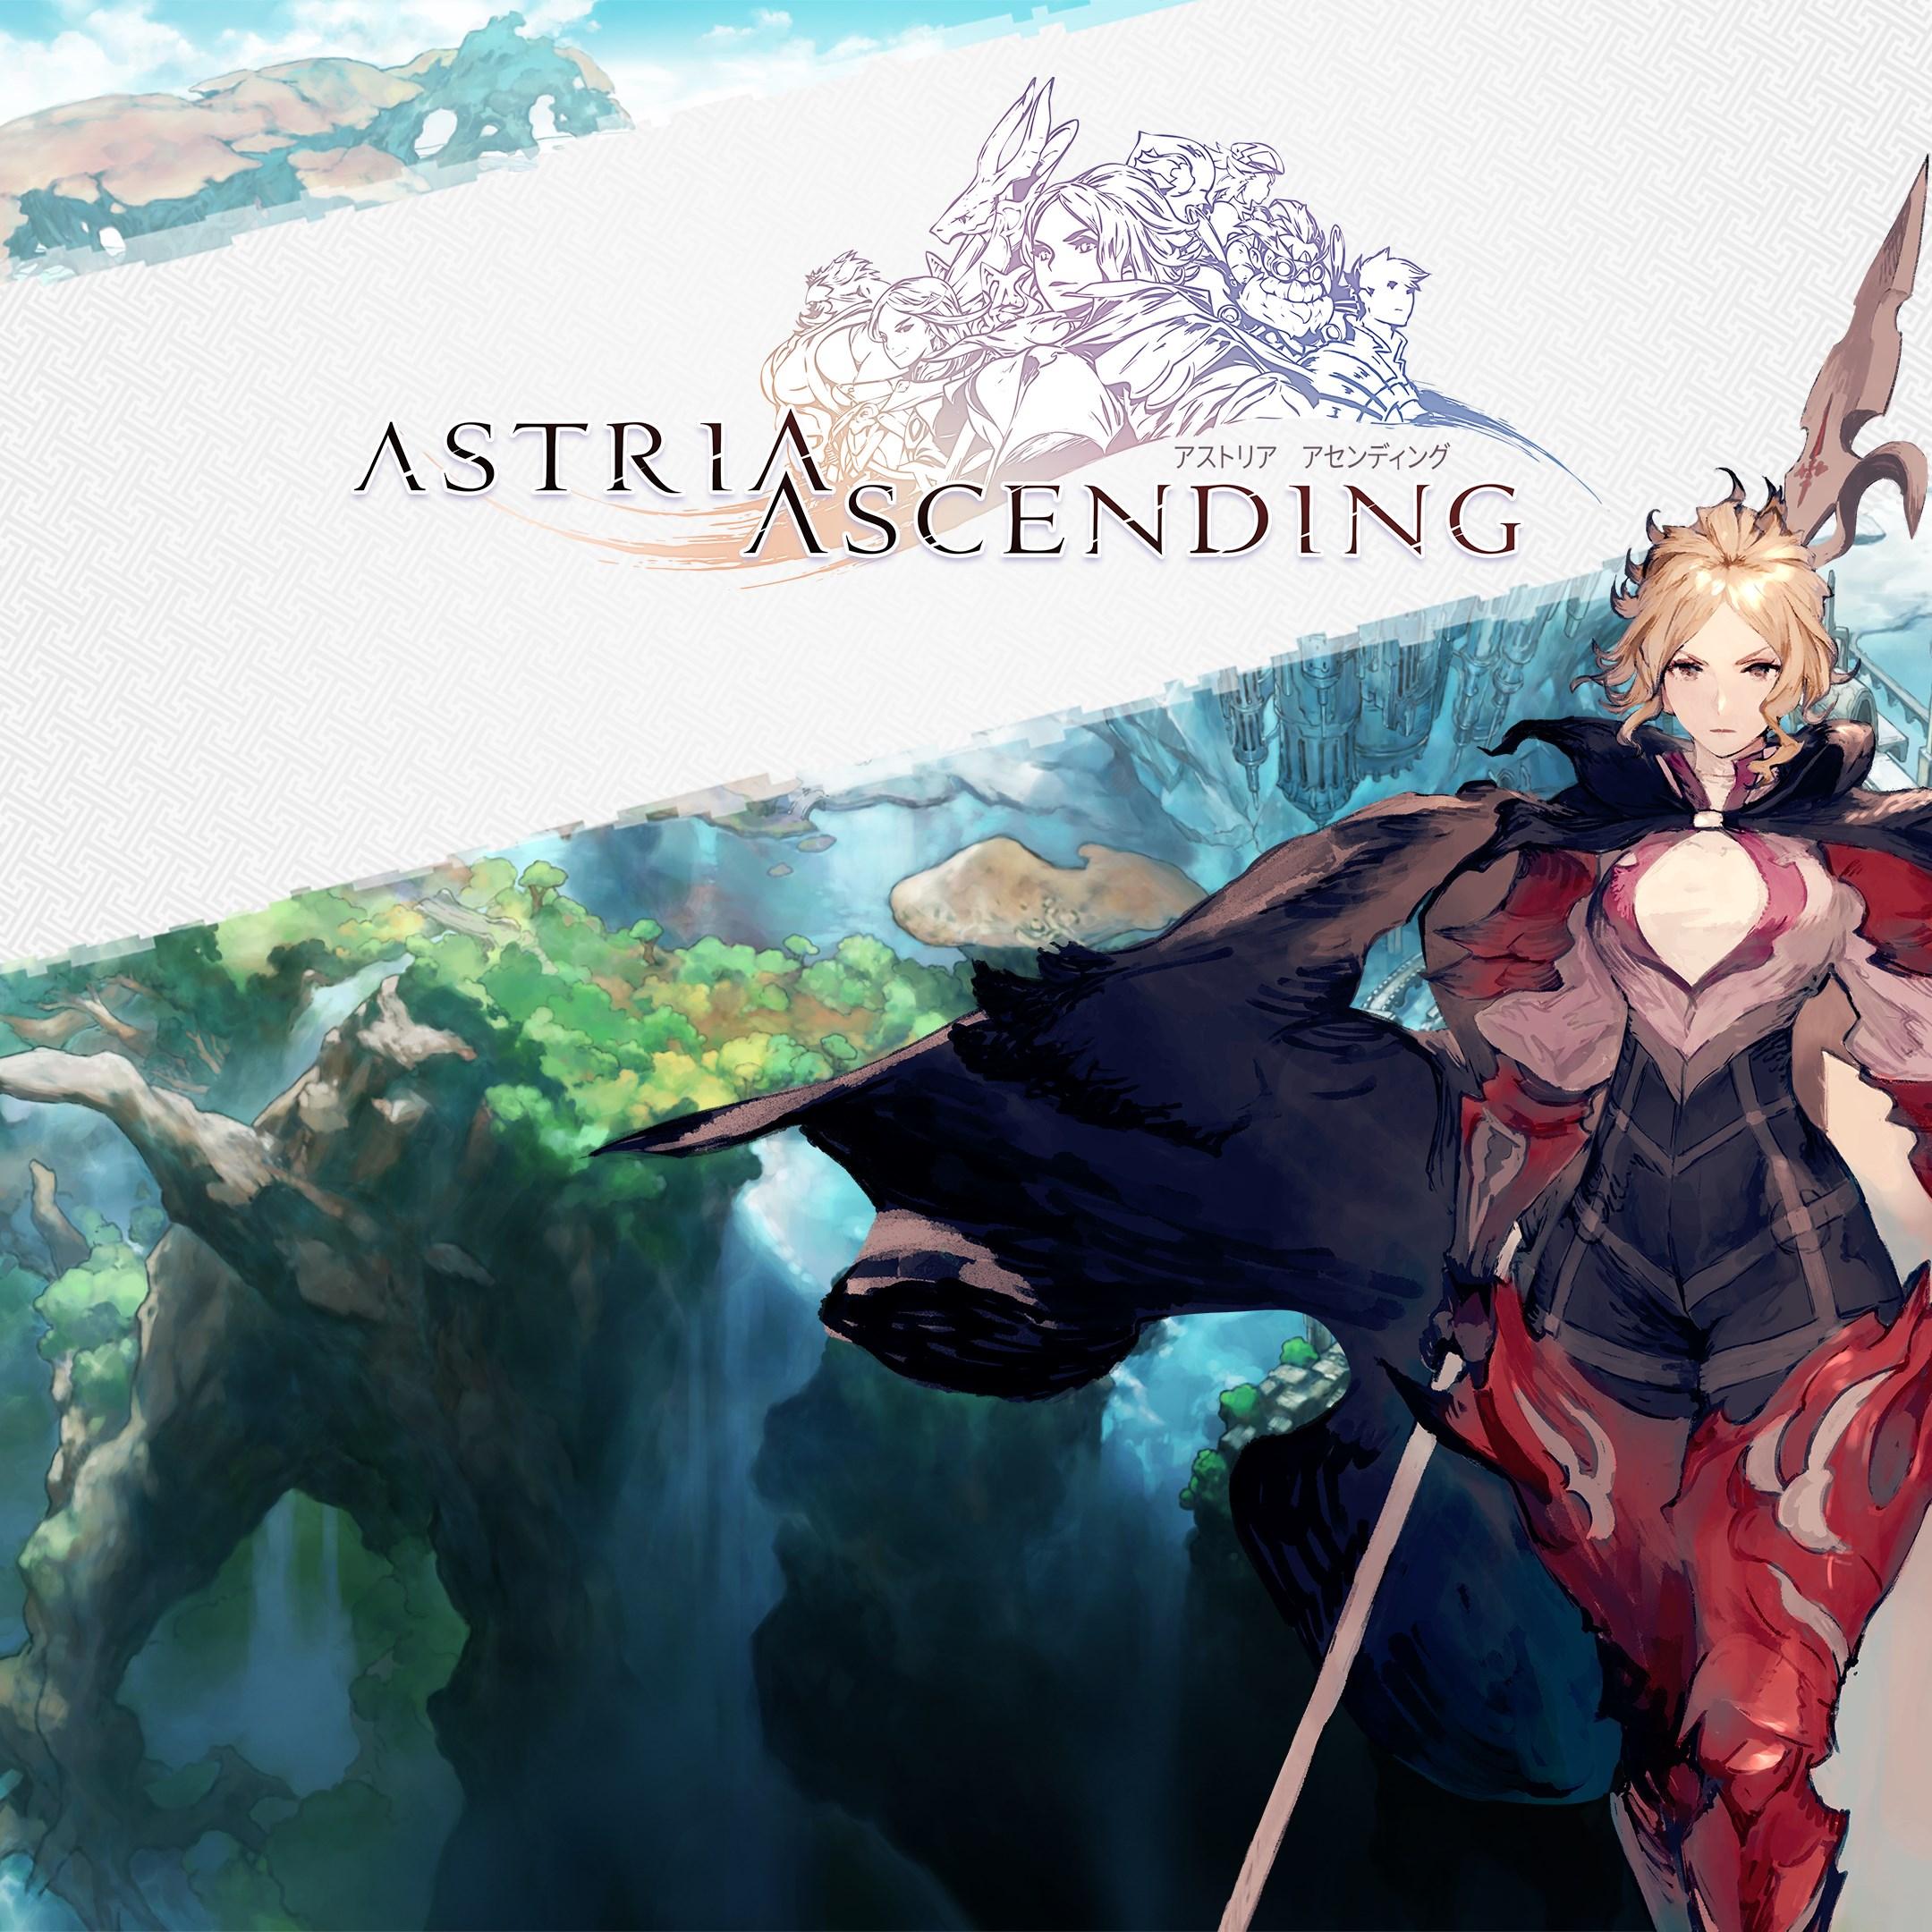 Image for Astria Ascending